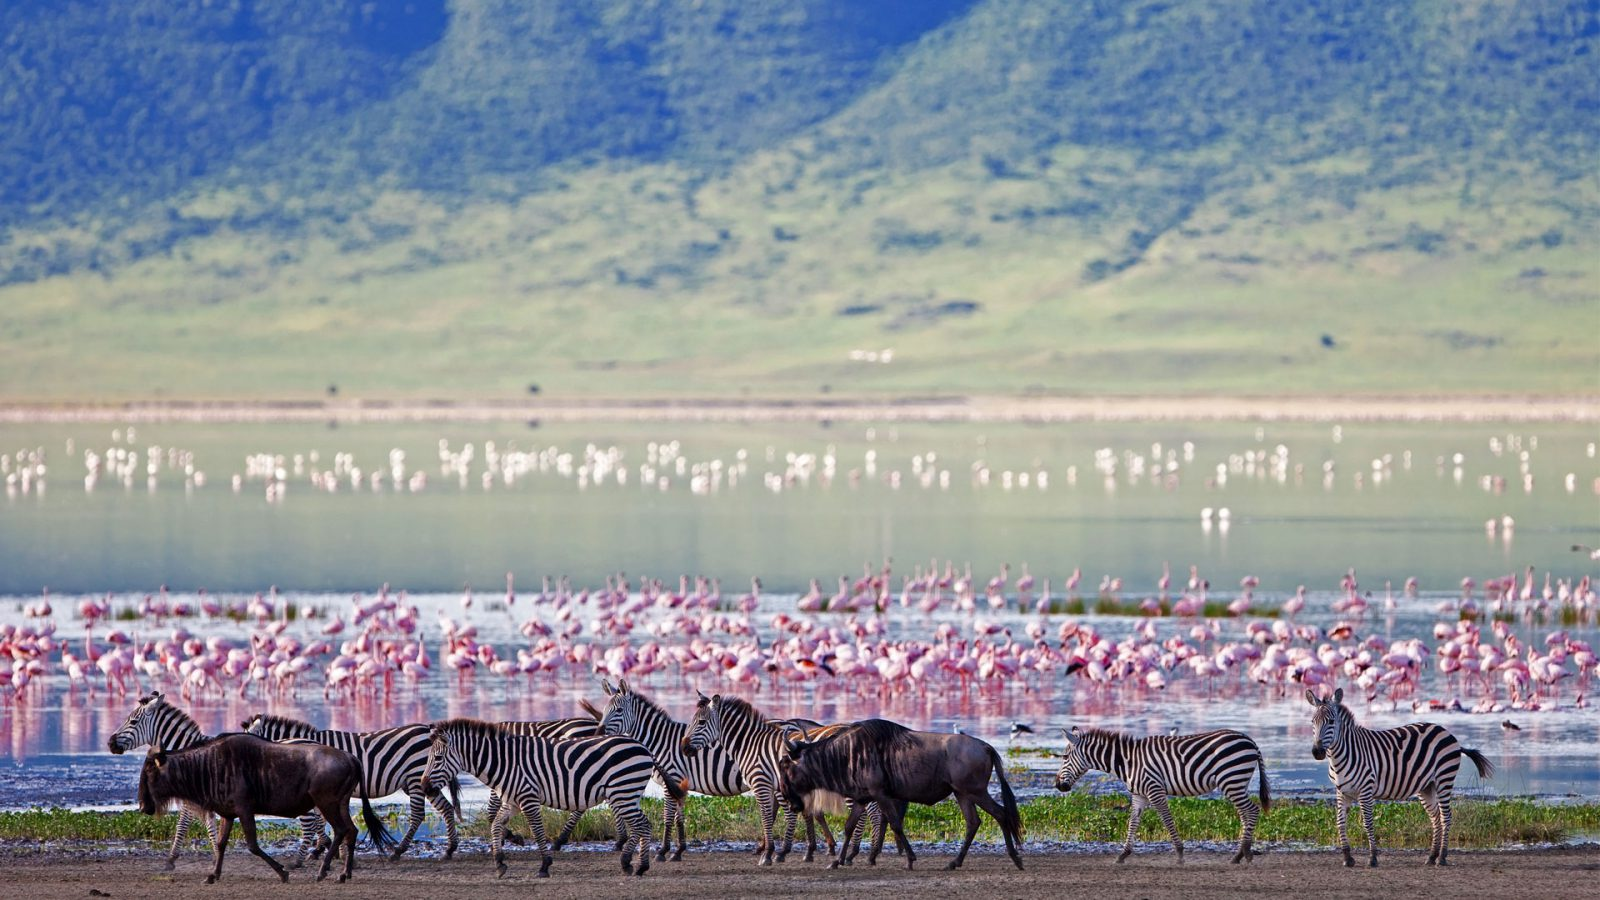 Travel Africa, Africa Safari Guide, Ngorongoro crater, Luxury African Safari